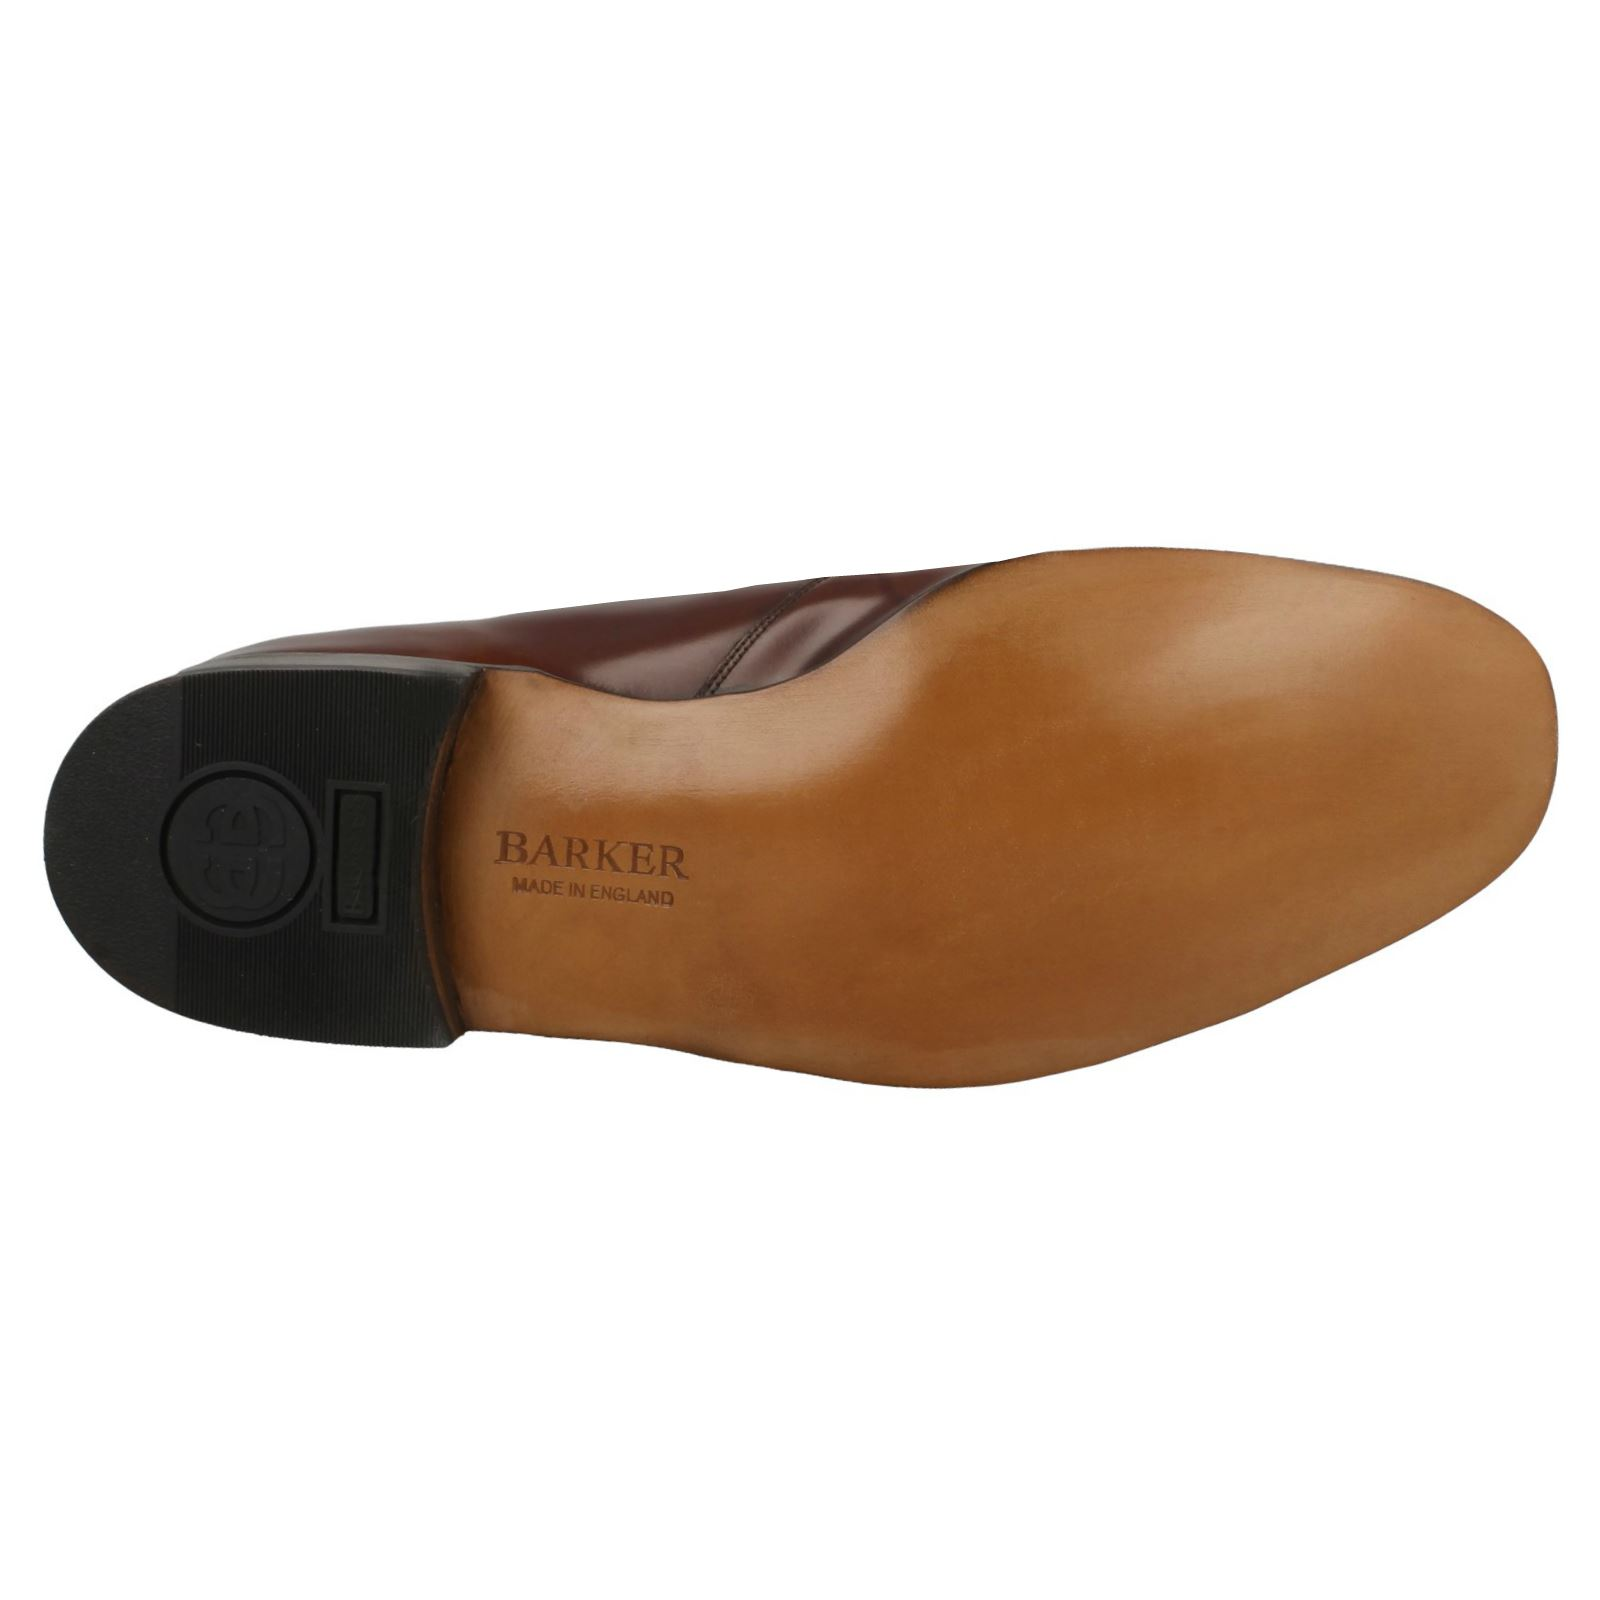 Herren Barker förmliche förmliche förmliche Schuhe 'Campbell' 0163bc